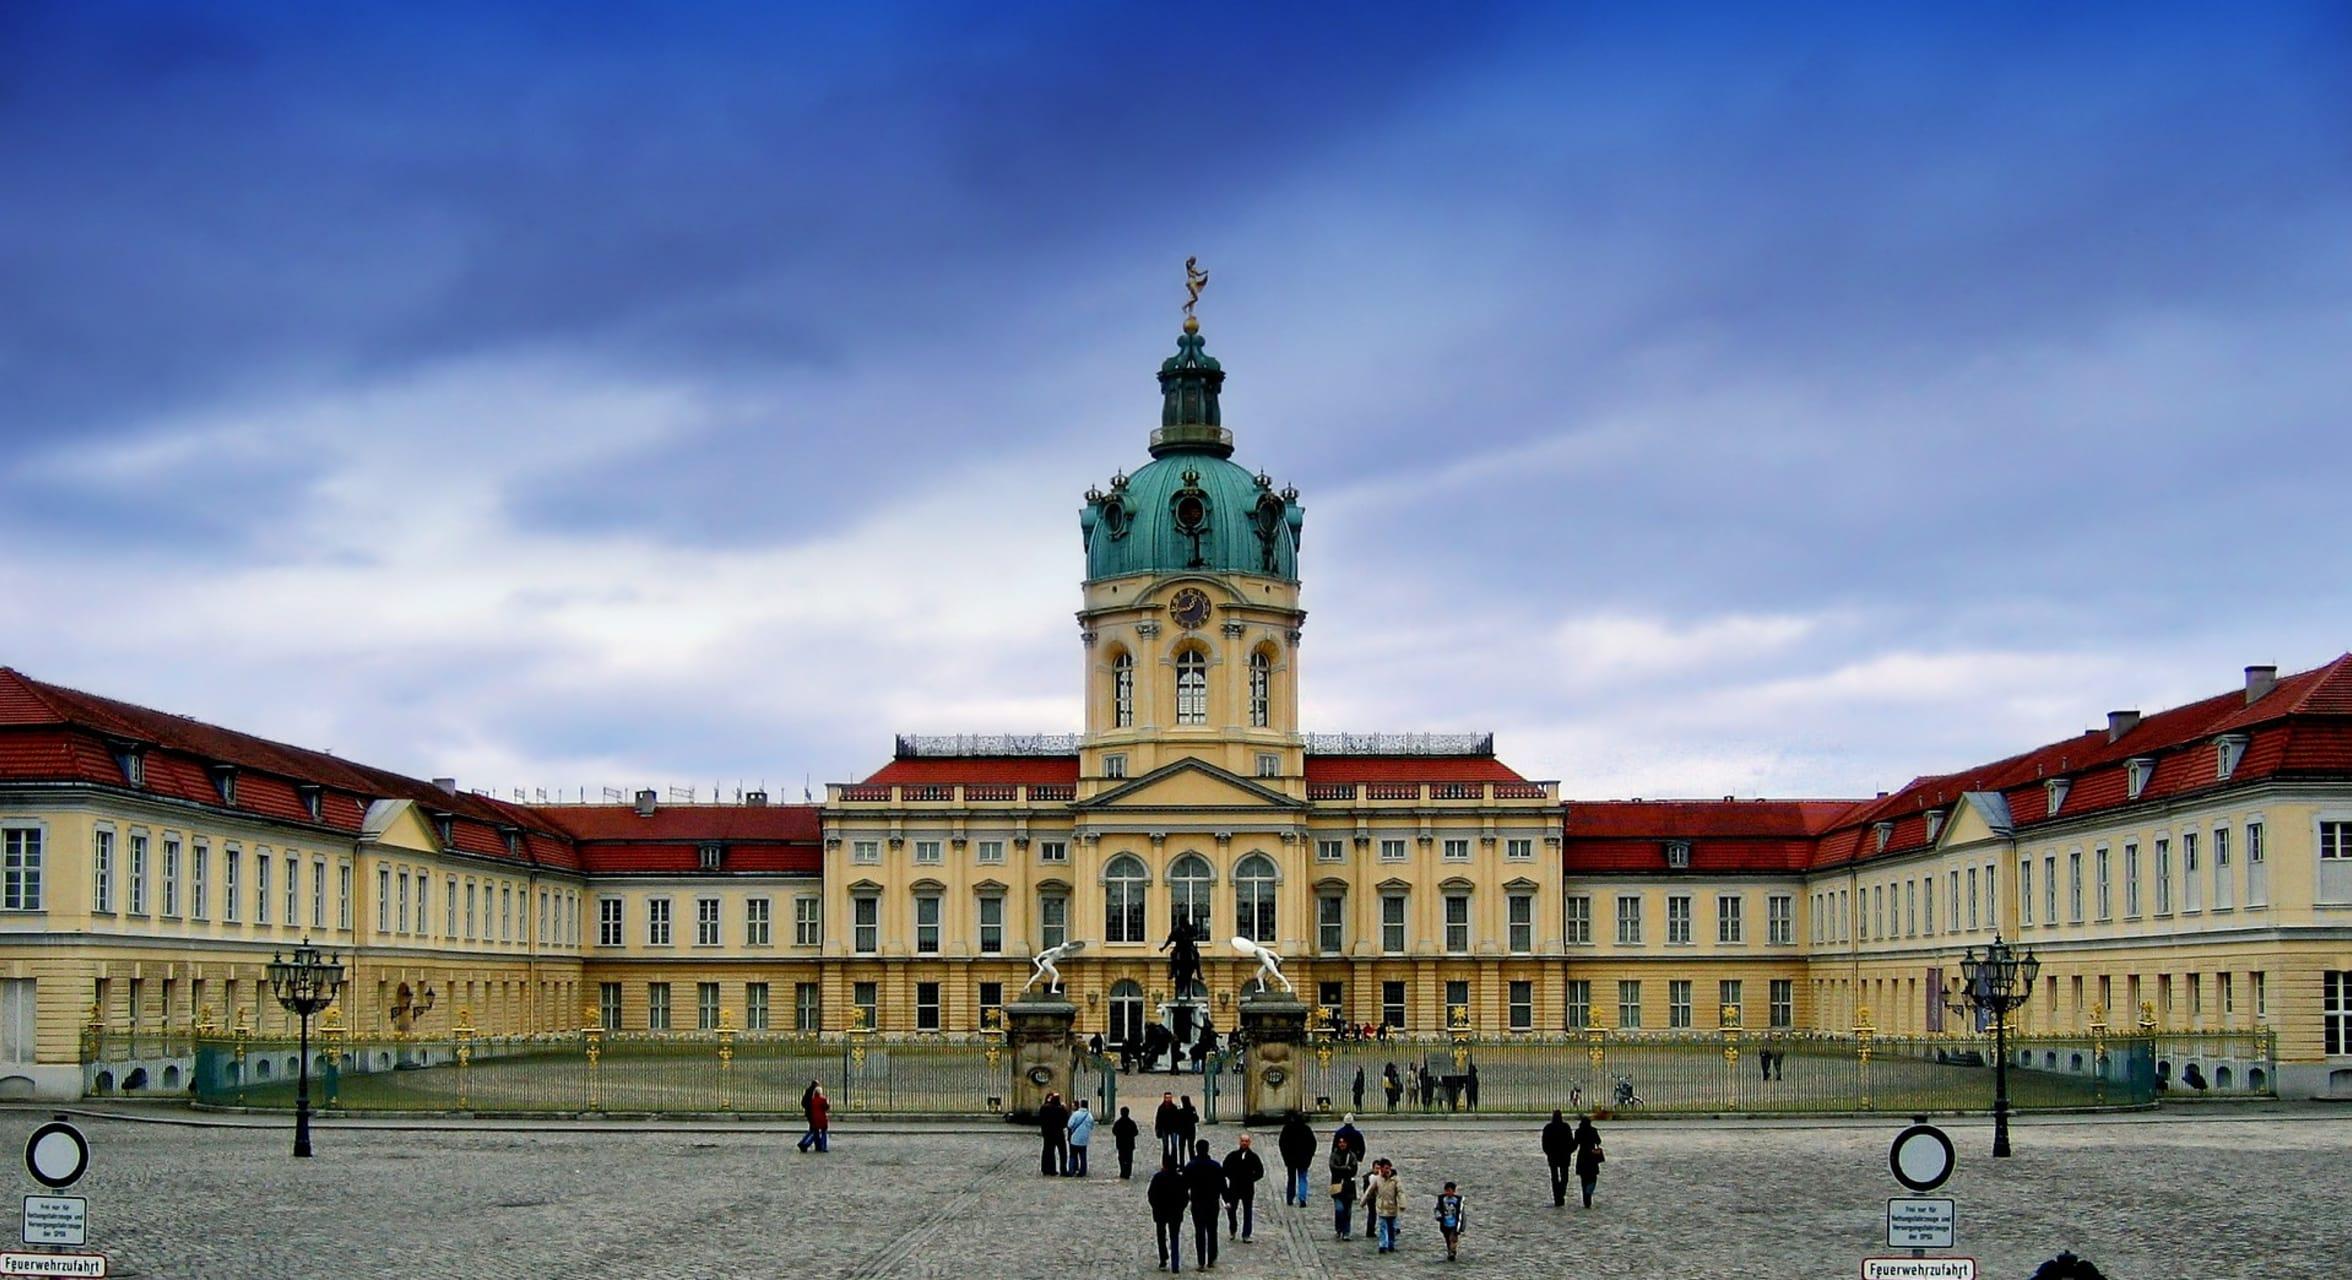 Berlin - A Walk around Charlottenburg Palace